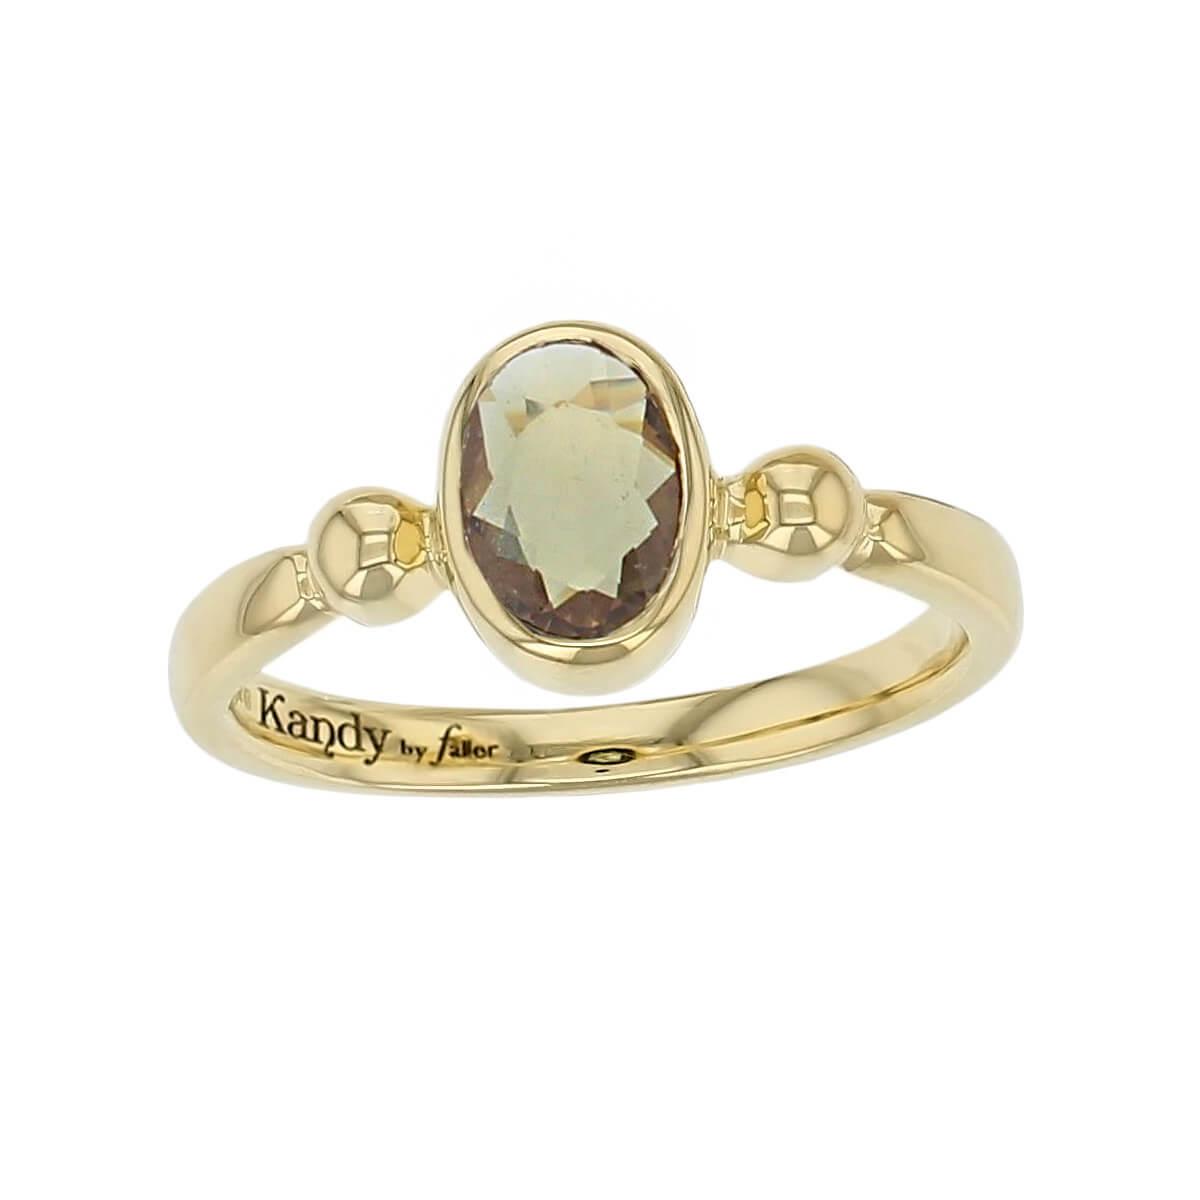 Kandy 18ct yellow gold pale cognac oval rose cut sapphire gemstone ladies dress ring, designer jewellery, gem, jewelry, handmade by Faller, Londonderry, Northern Ireland, Irish hand crafted